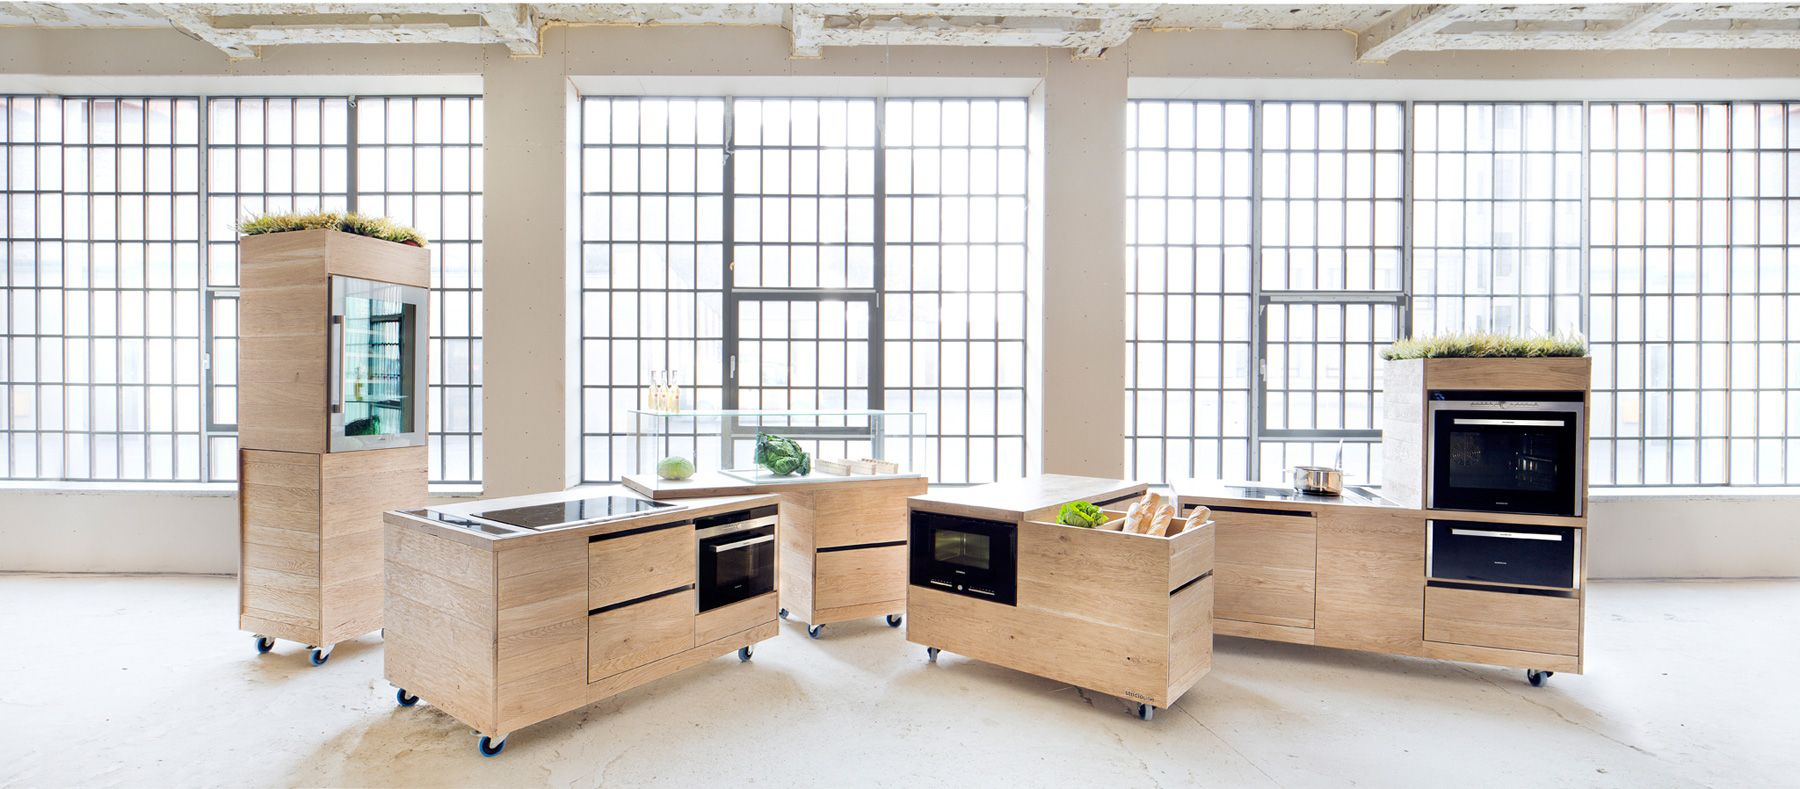 Siemens Foodlab Modular Kitchen  Kitchens Enchanting Compact Modular Kitchen Designs Design Inspiration